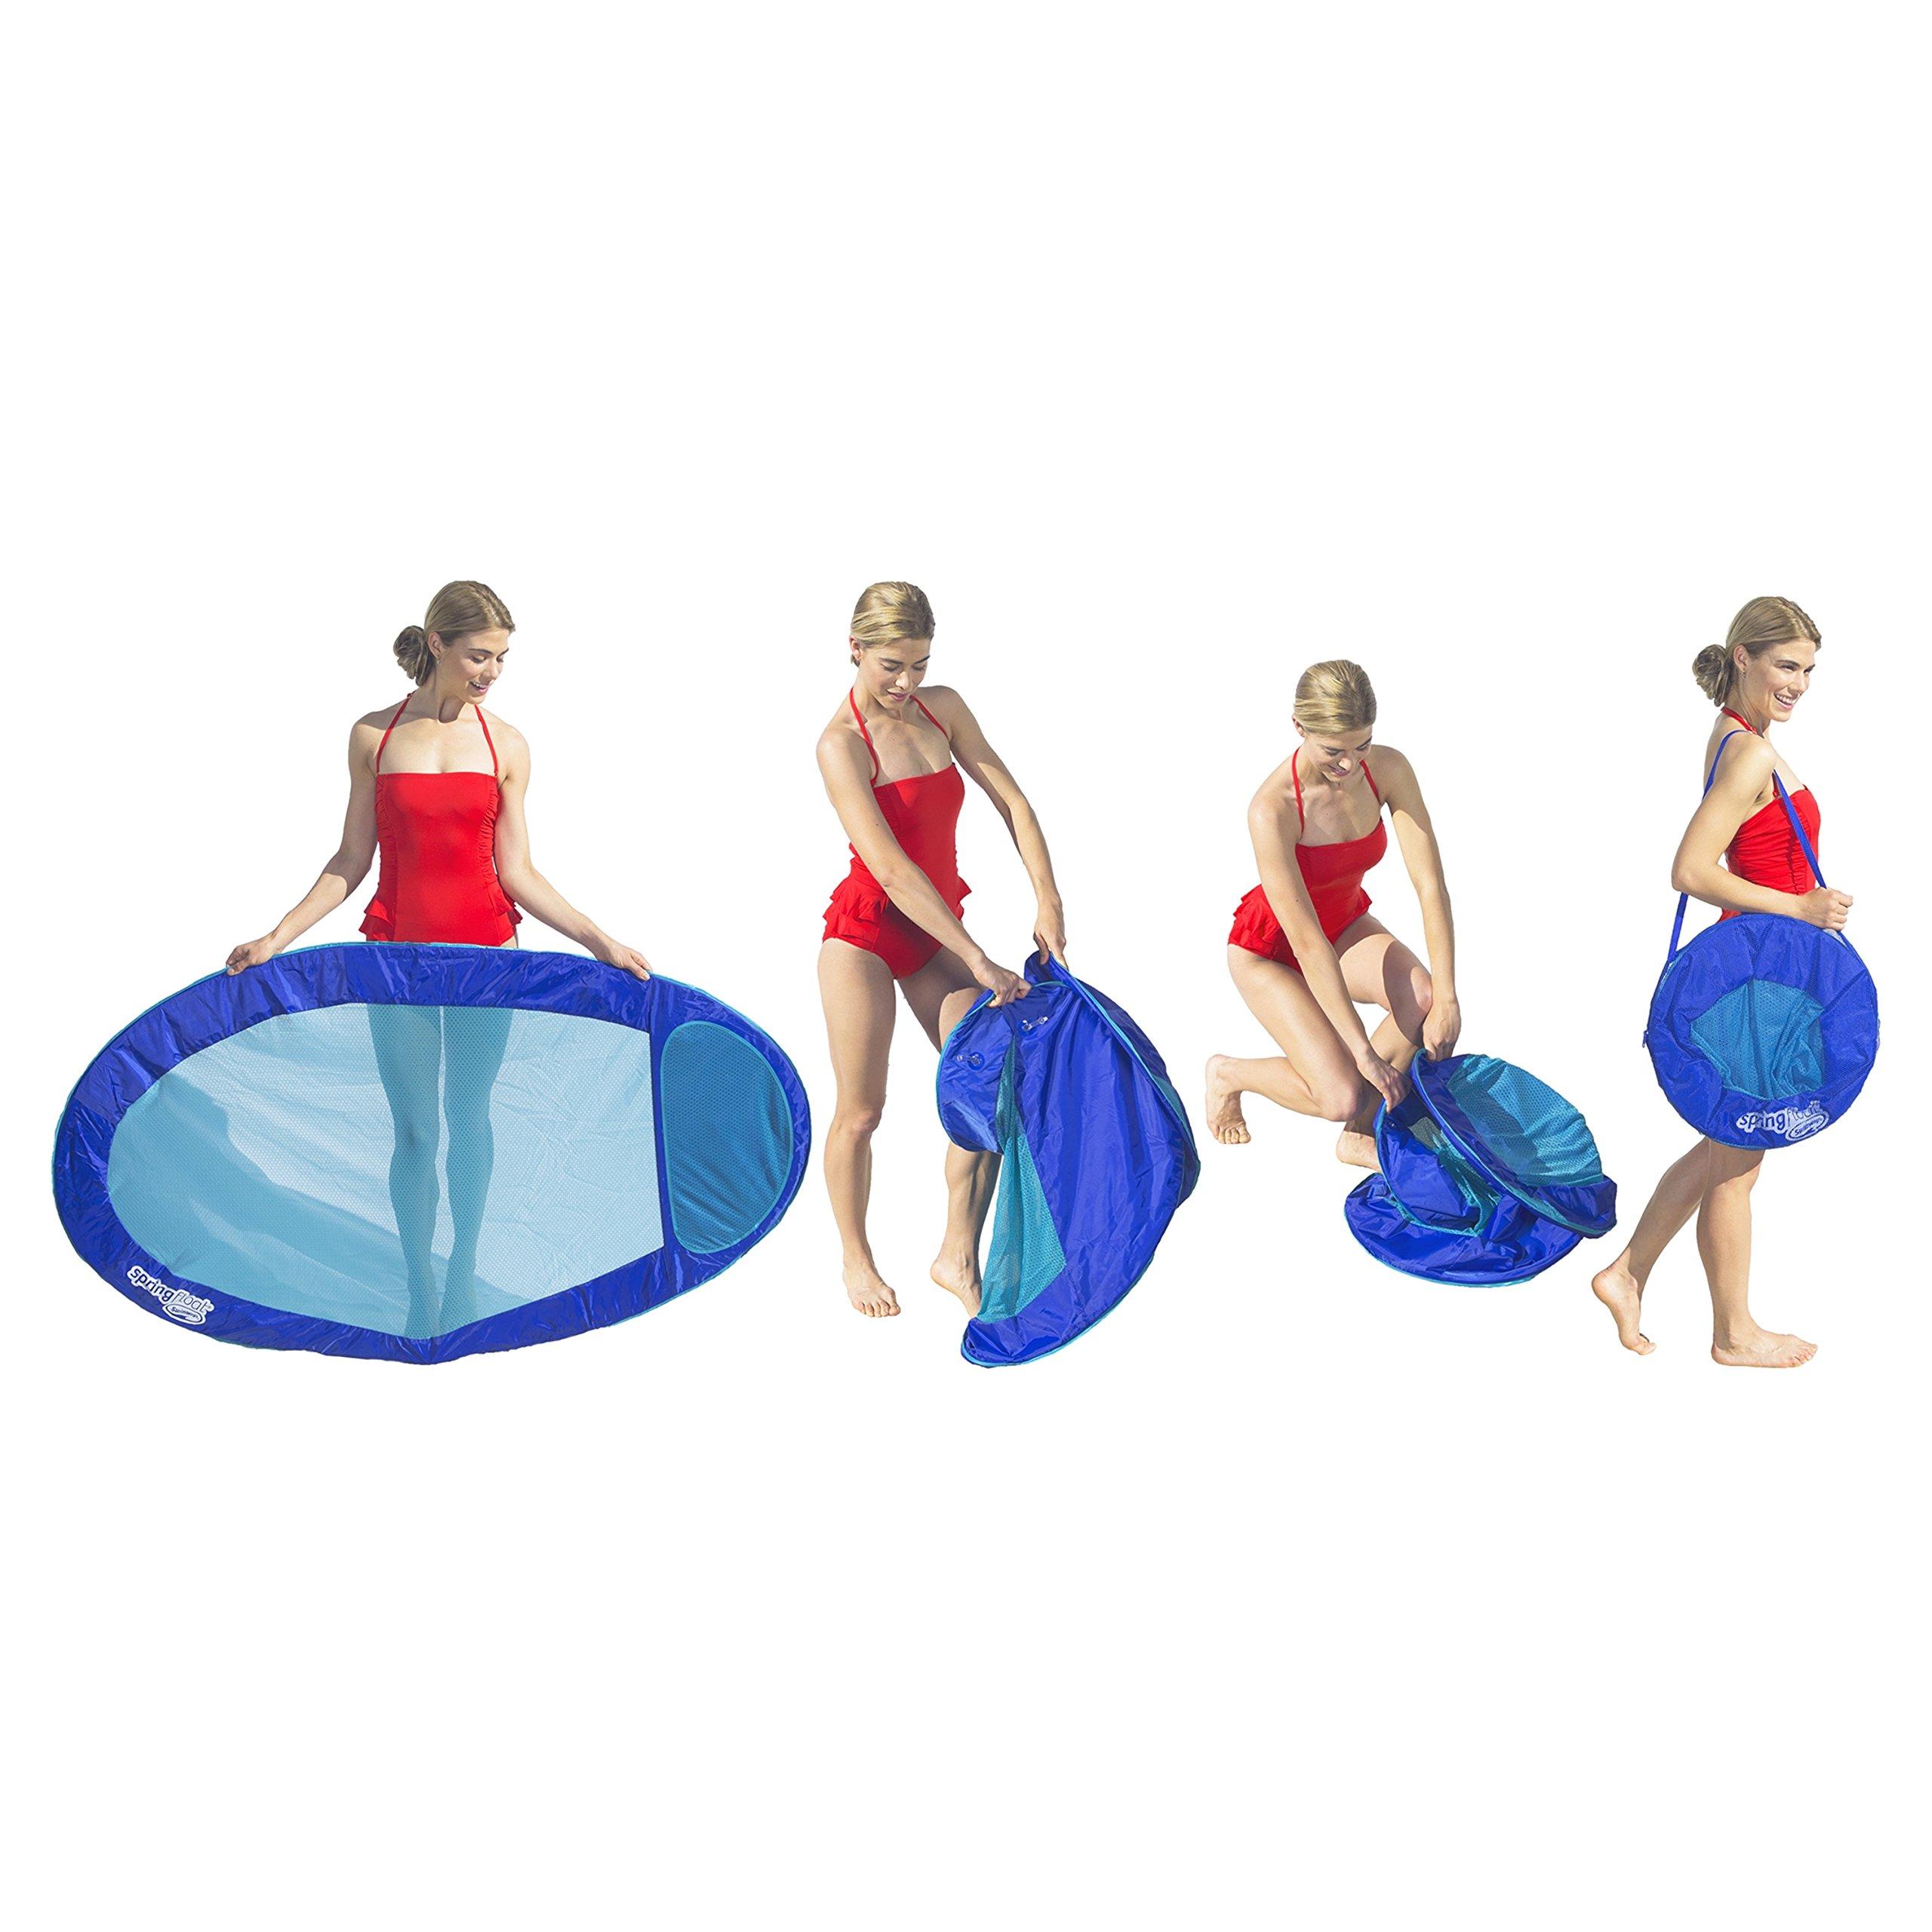 SwimWays Original Spring Float - Floating Swim Hammock for Pool or Lake - Lime/Light Blue by SwimWays (Image #4)